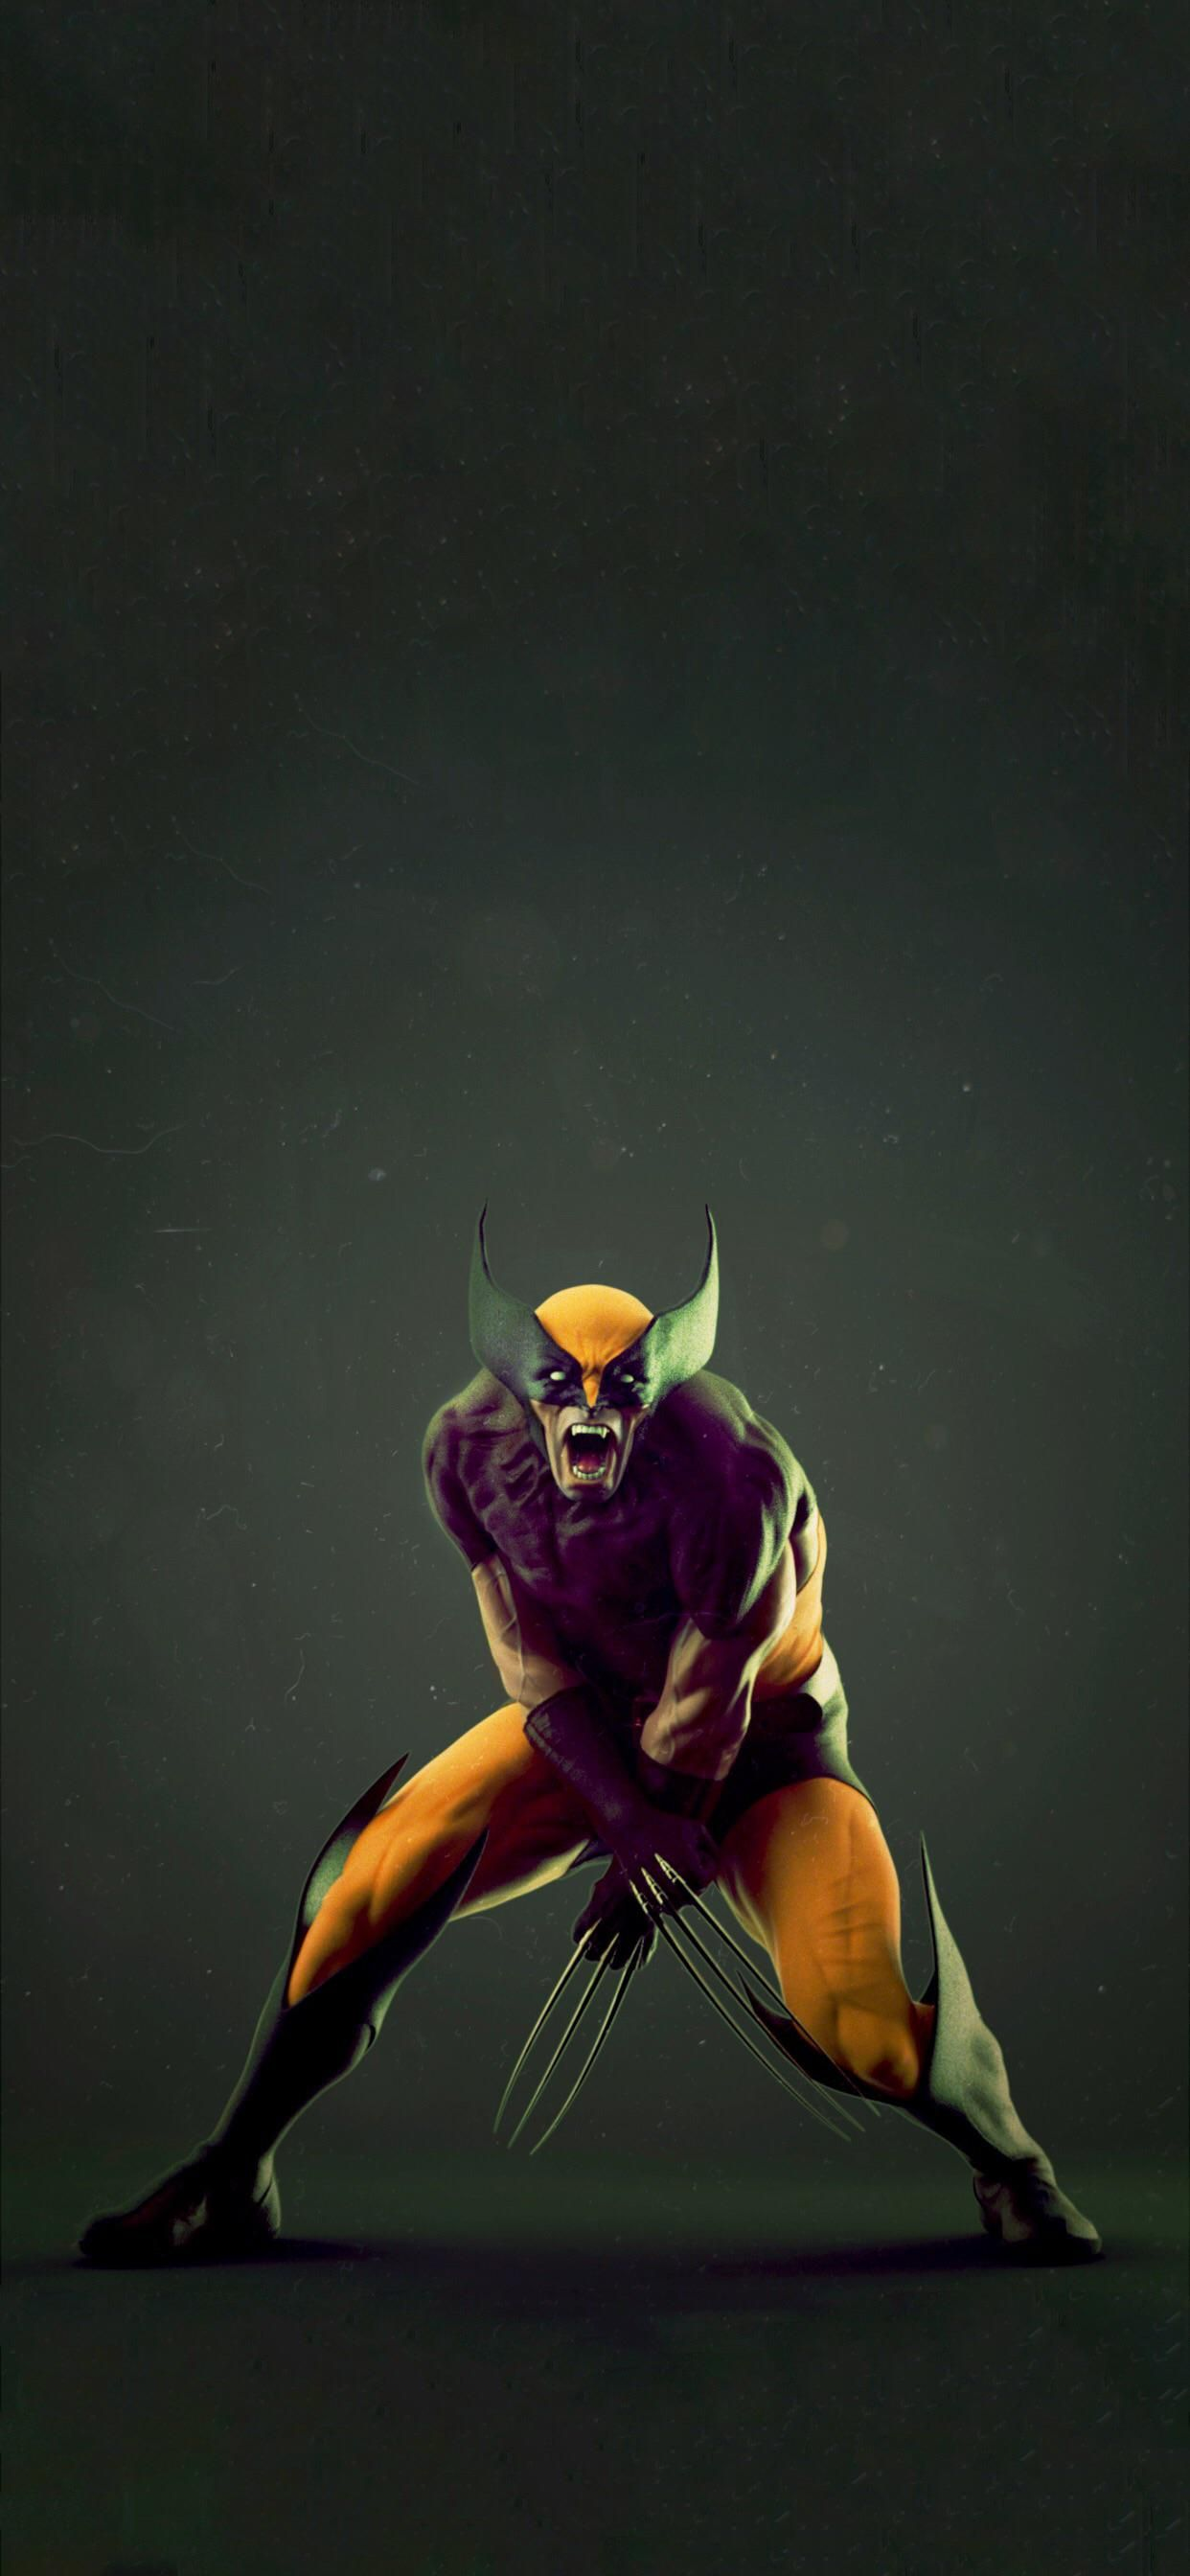 Pin By Scott Wheeler On Wallpapers In 2021 Wolverine Wallpaper Marvel Comics Art Wolverine